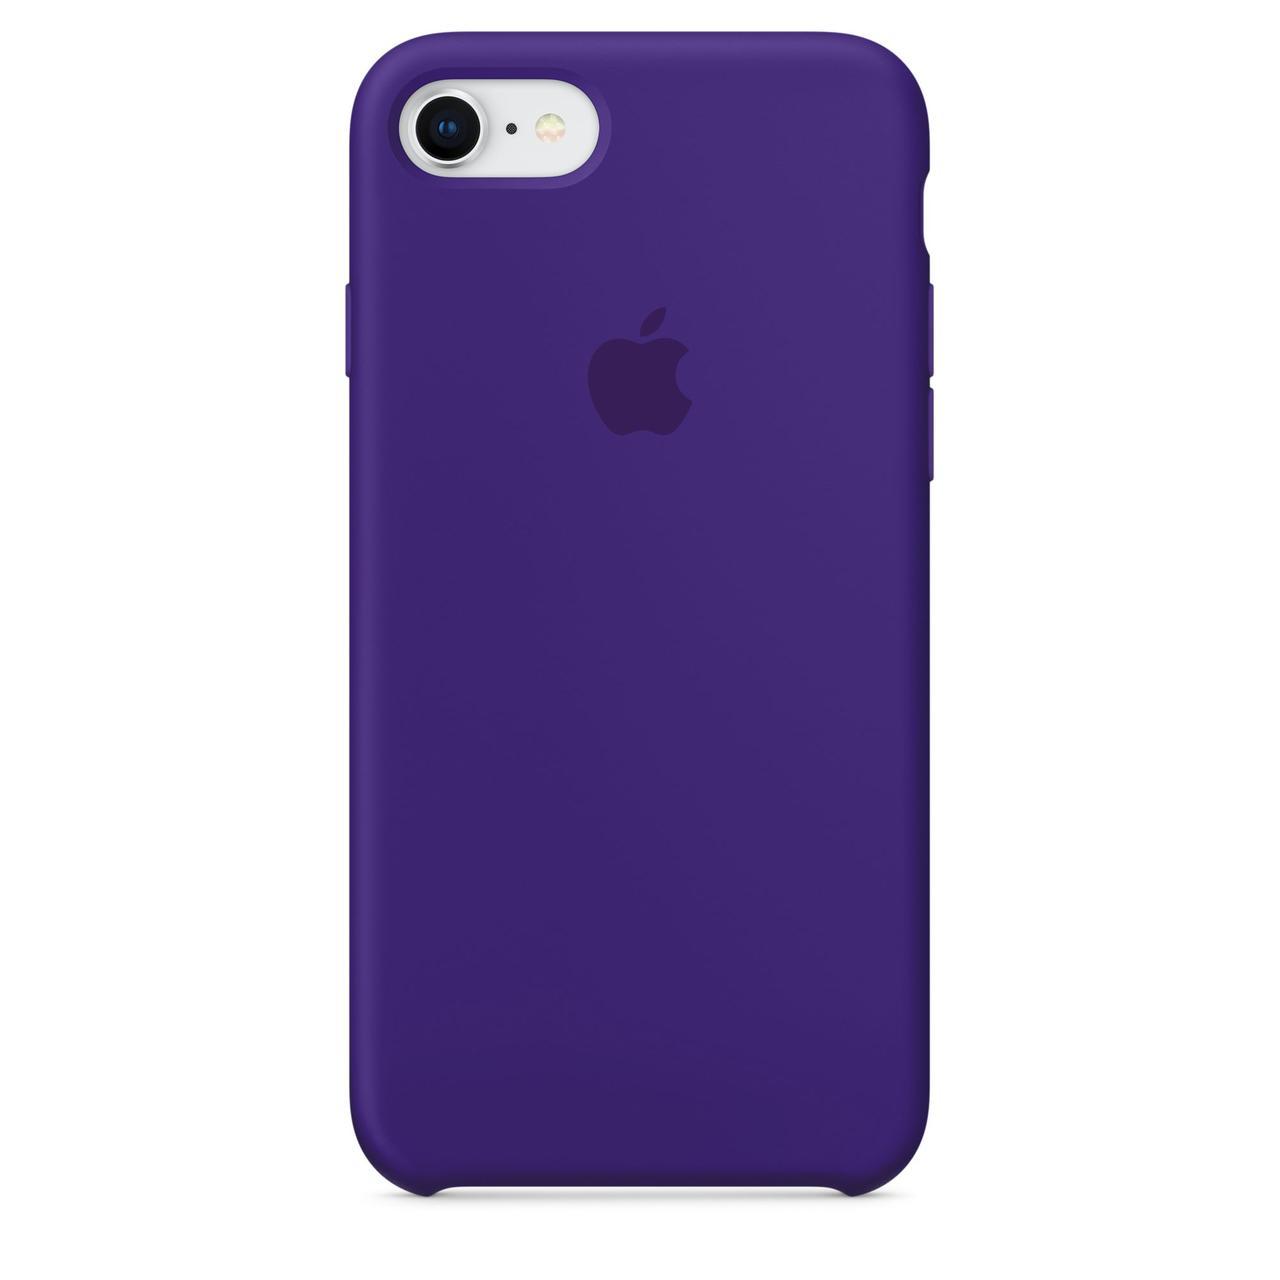 Чехол Apple Silicone Case для iPhone 7 Ultra Violet (16544)